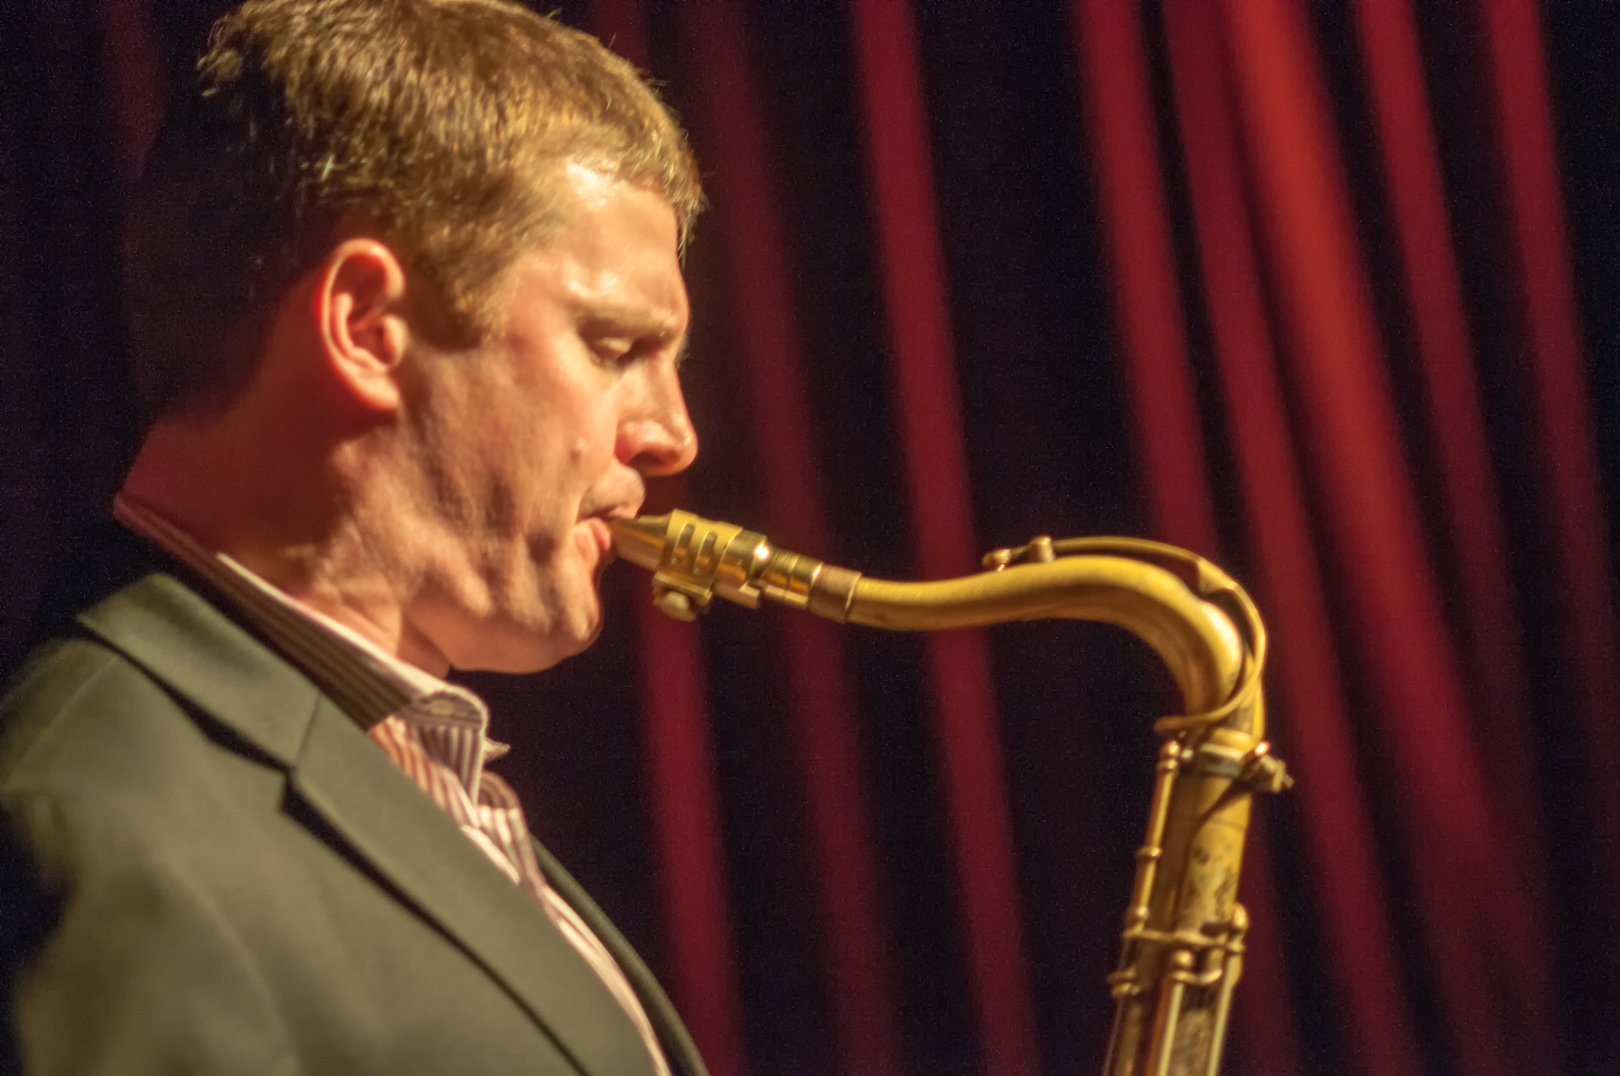 Eric Alexander with the Mabern Alexander Quartet at the John at the John Coltrane Festival at Smoke Jazz Club